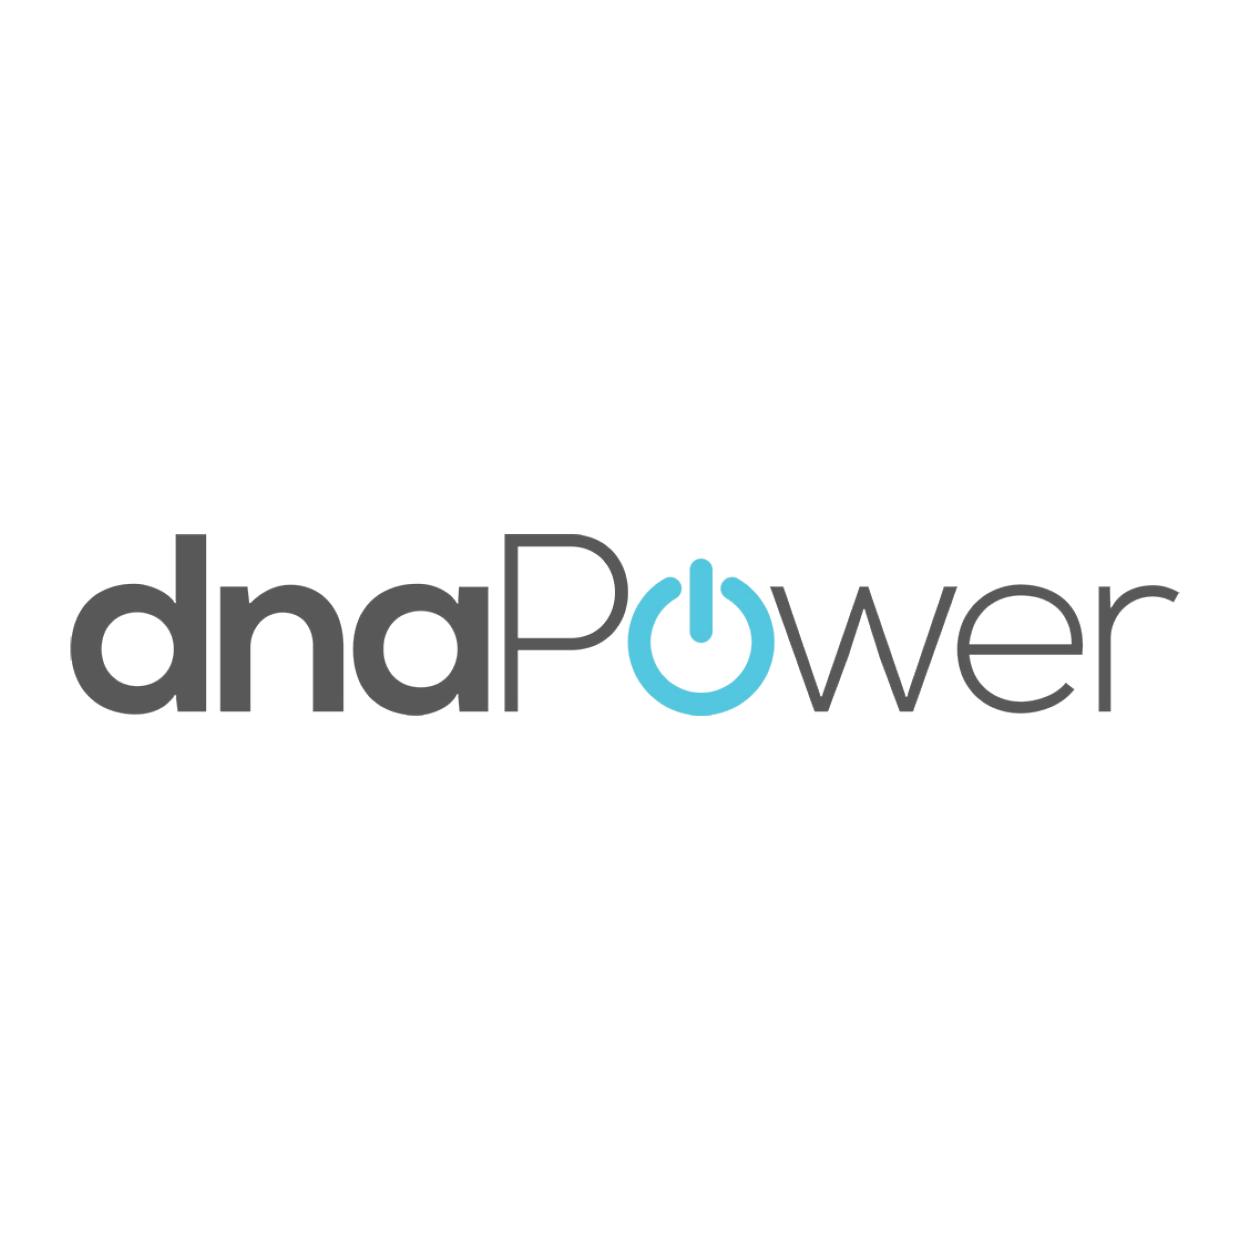 dnaPower